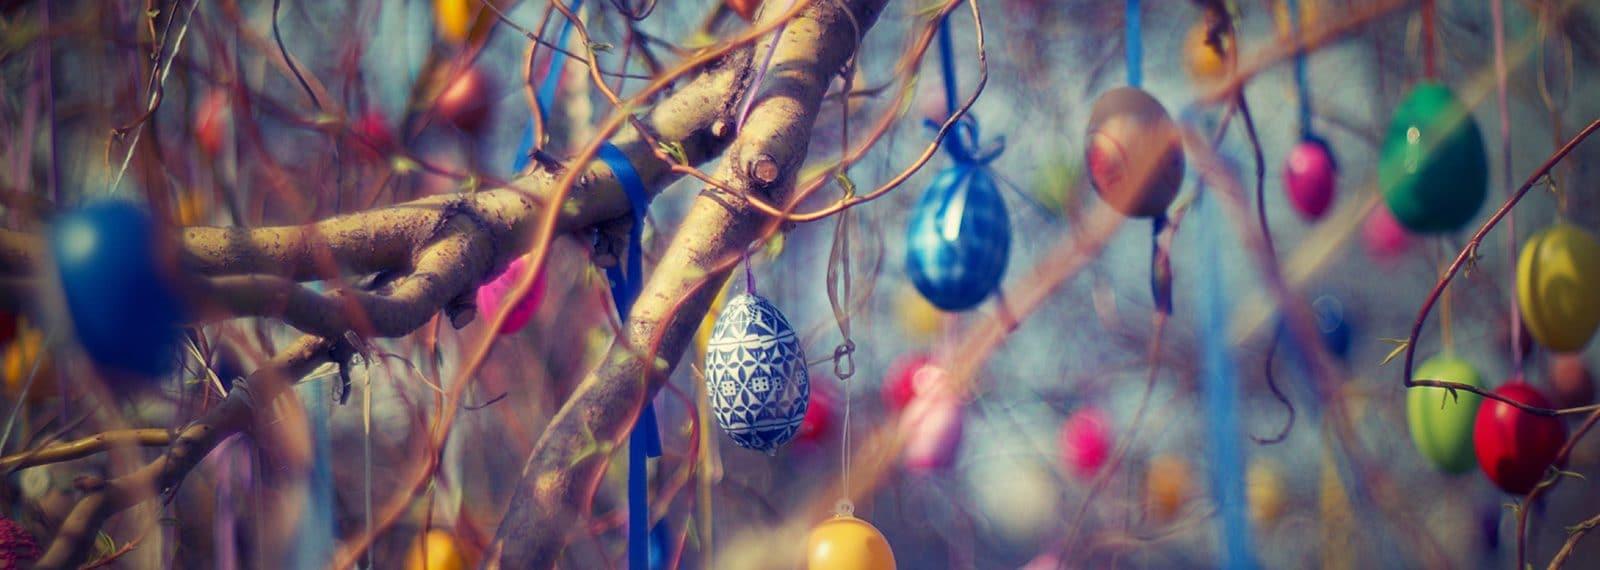 Ostereier im Baum